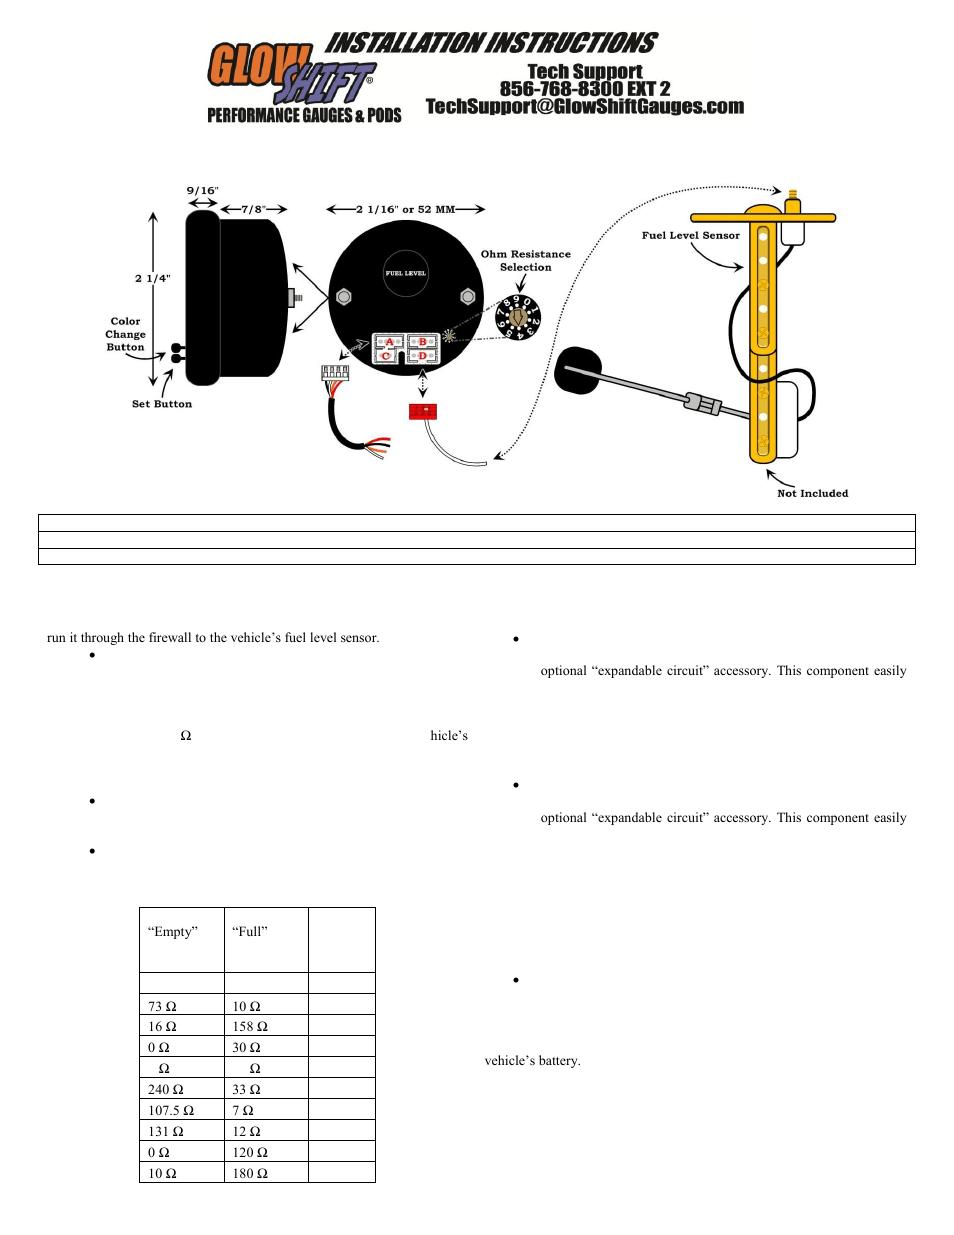 hight resolution of glowshift elite 10 color fuel level gauge user manual 3 pages fuel level sensor wiring